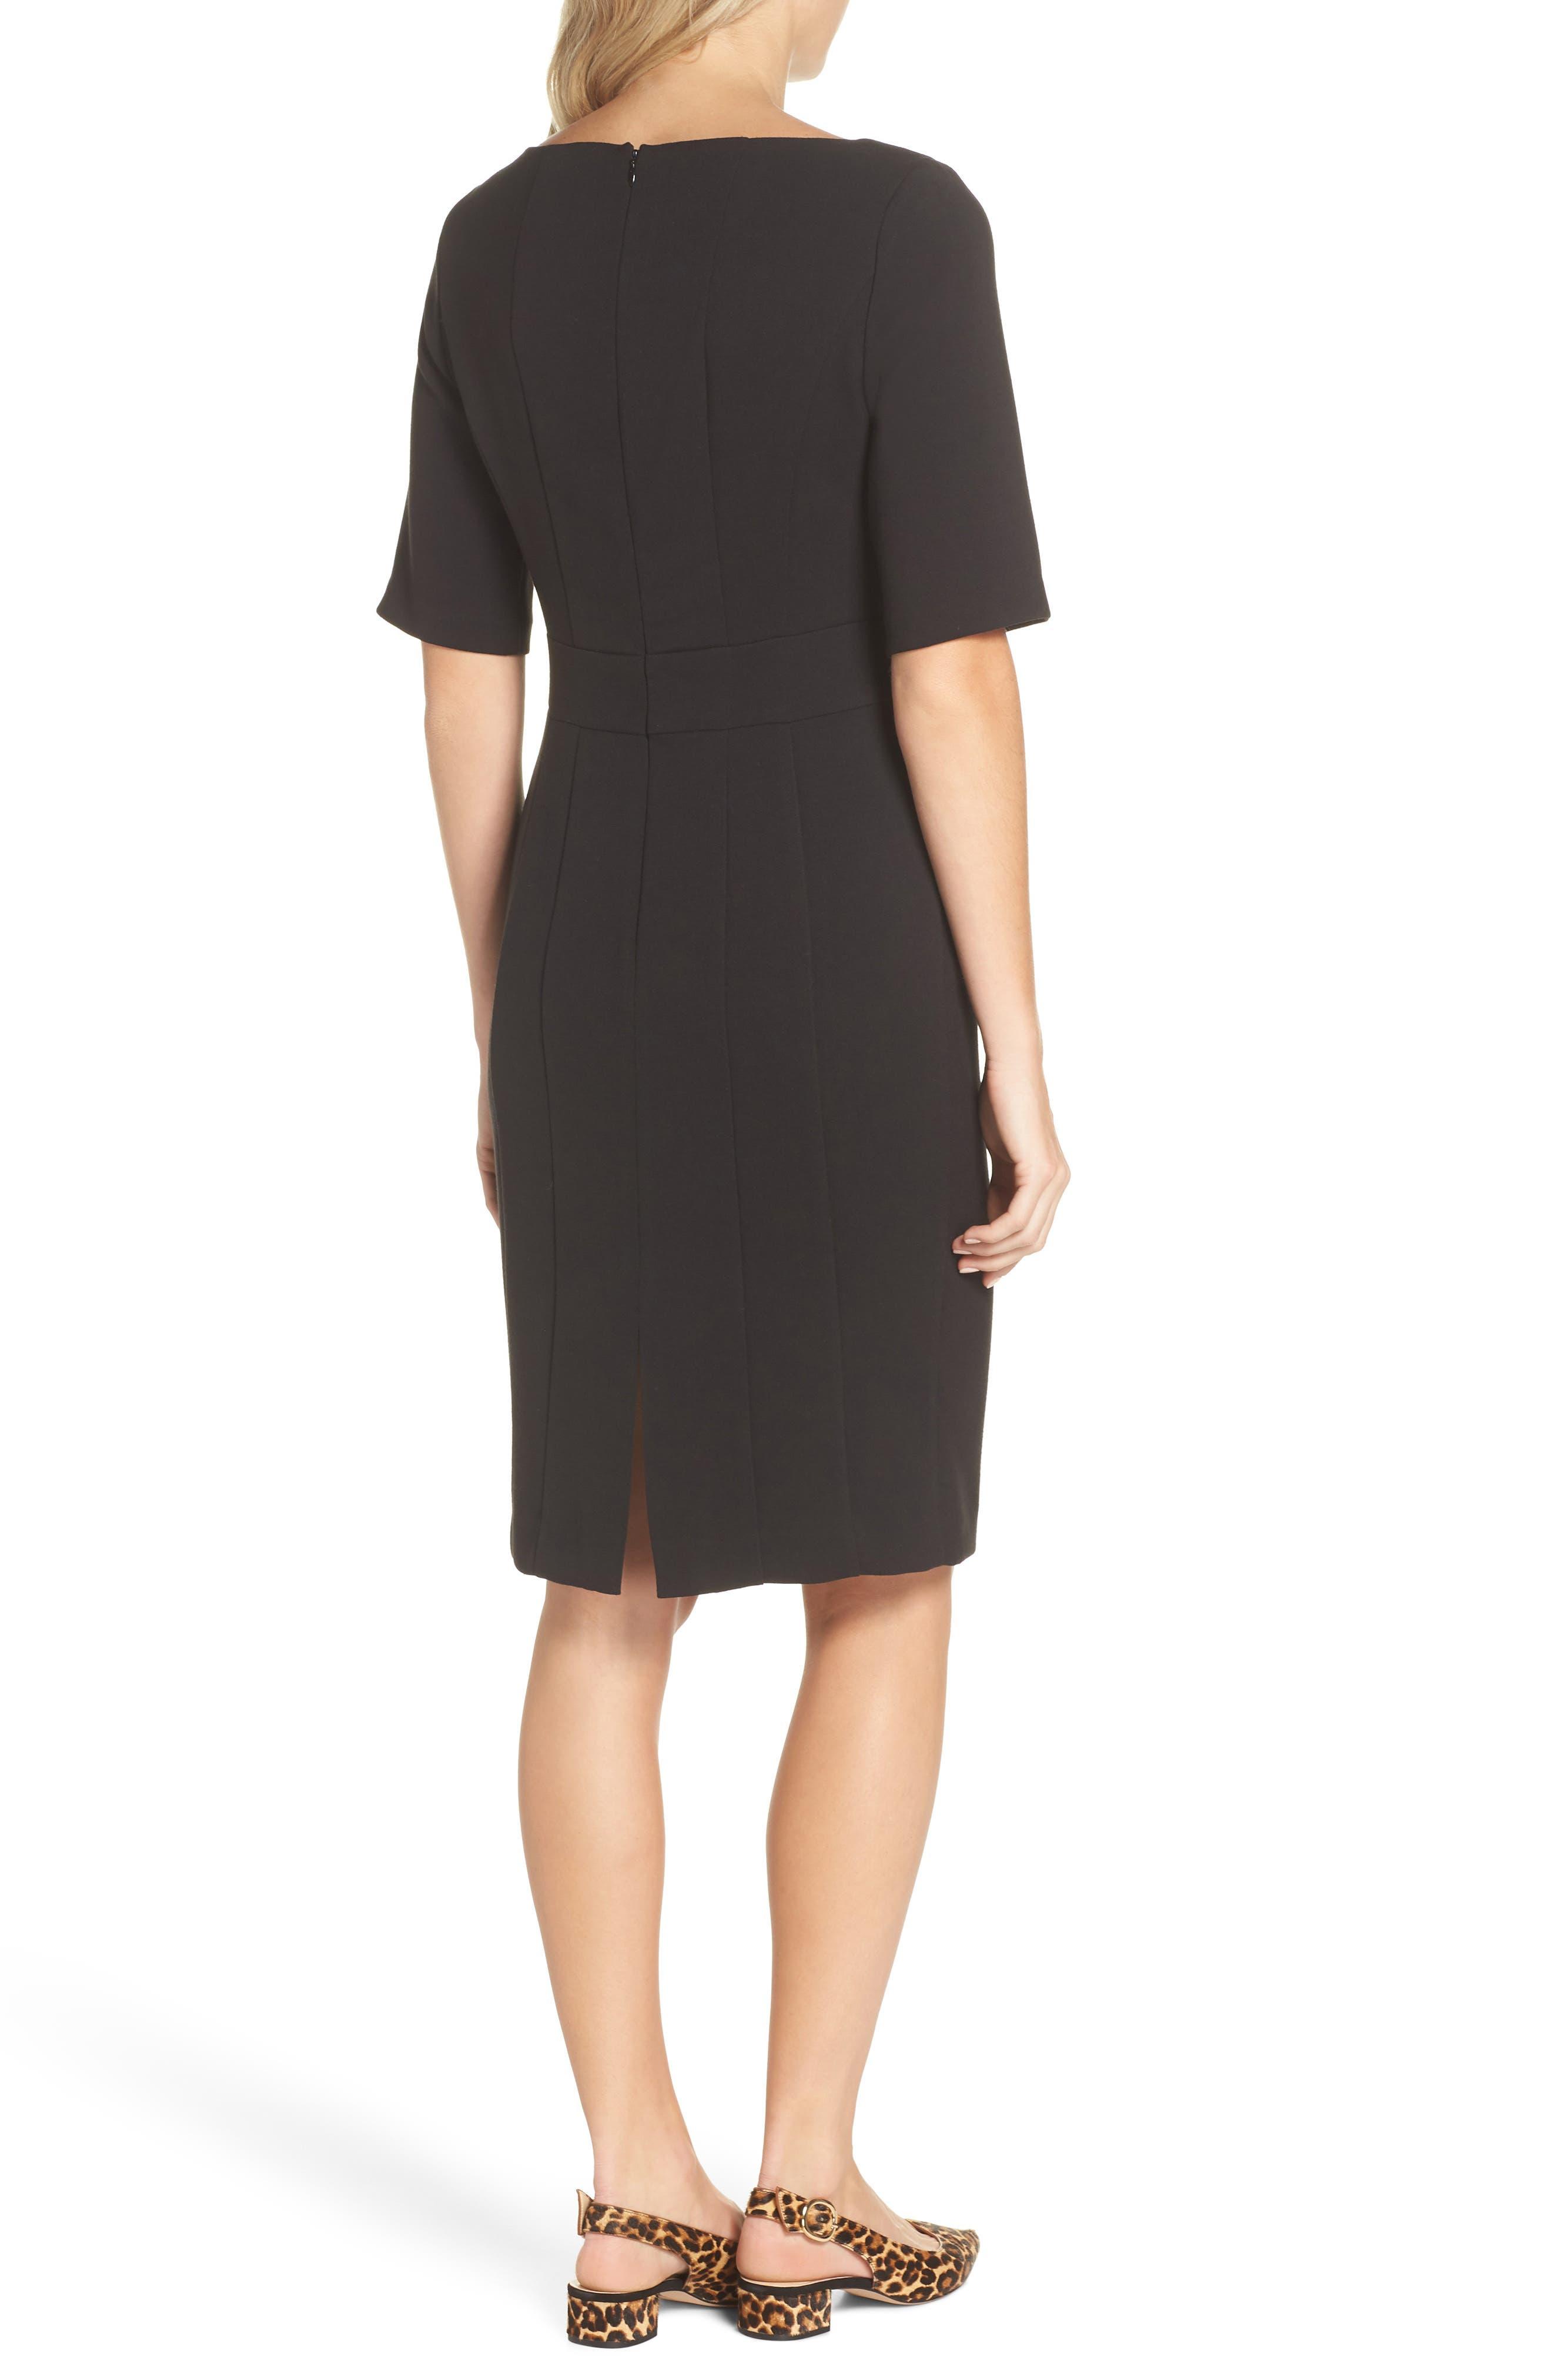 ELIZA J, Bateau Neck Crepe Sheath Dress, Alternate thumbnail 2, color, BLACK